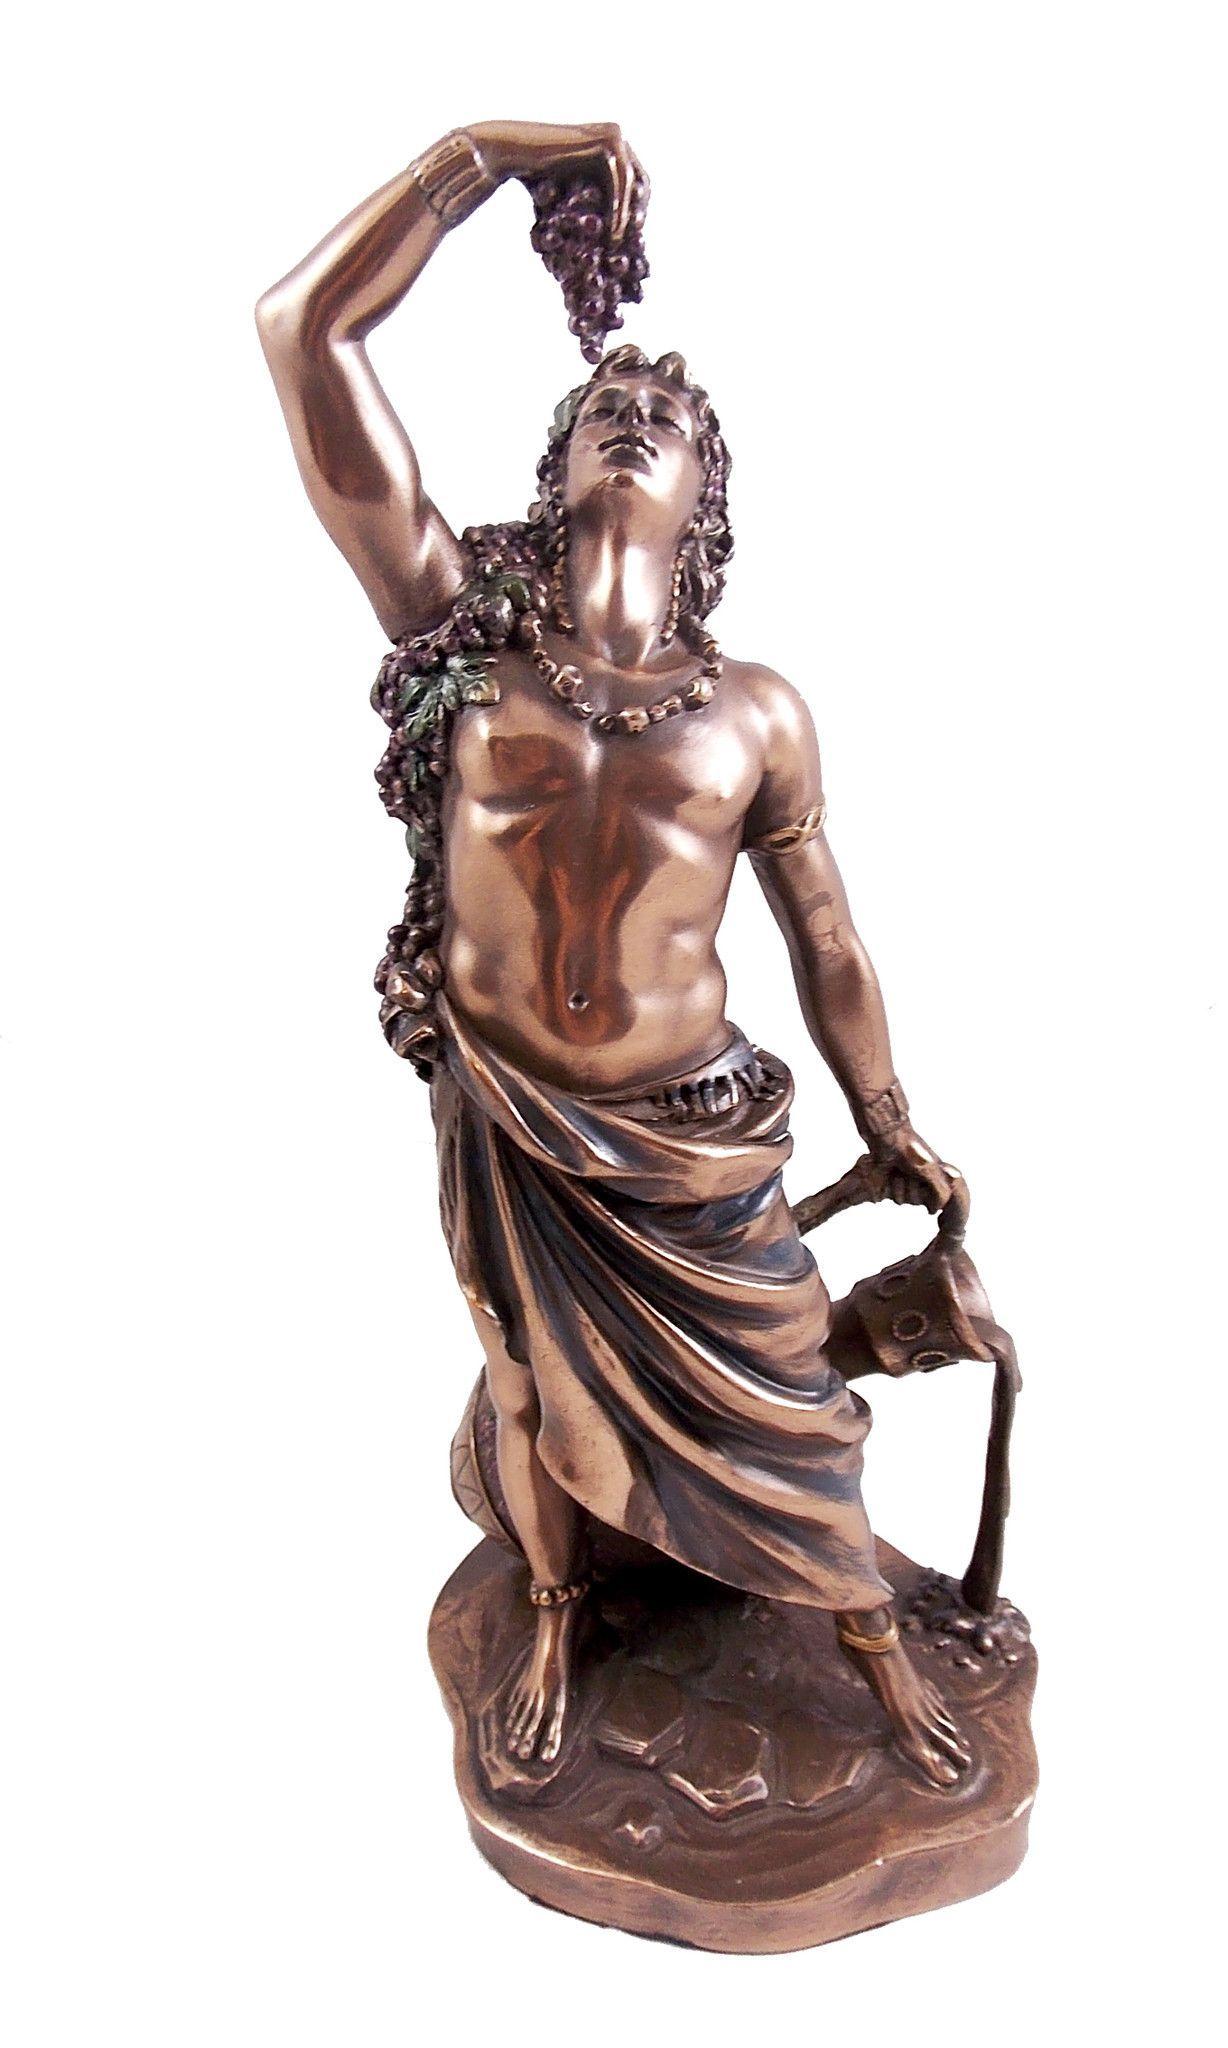 dionysus statue dionysus greek and mythology